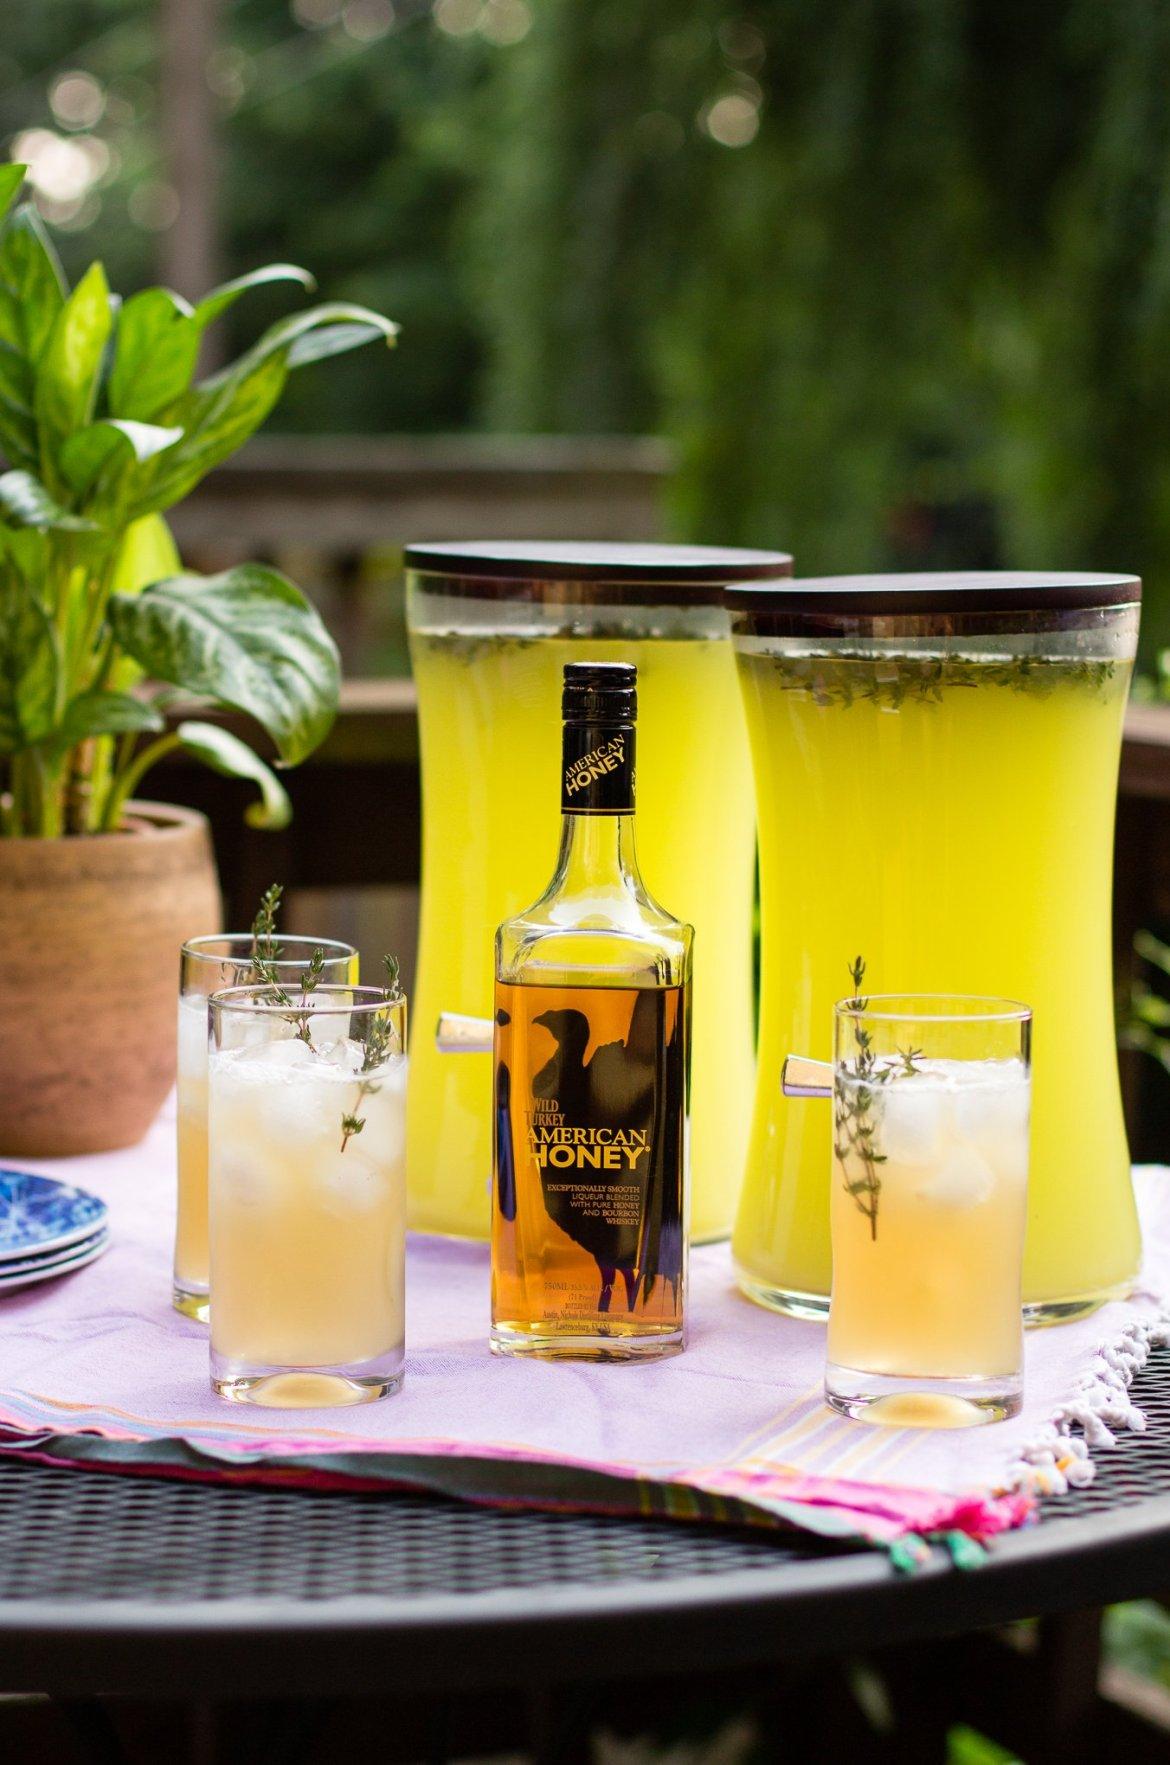 american honey, wild turkey, bourbon, summer cocktail recipes, summer get togethers, sponsored